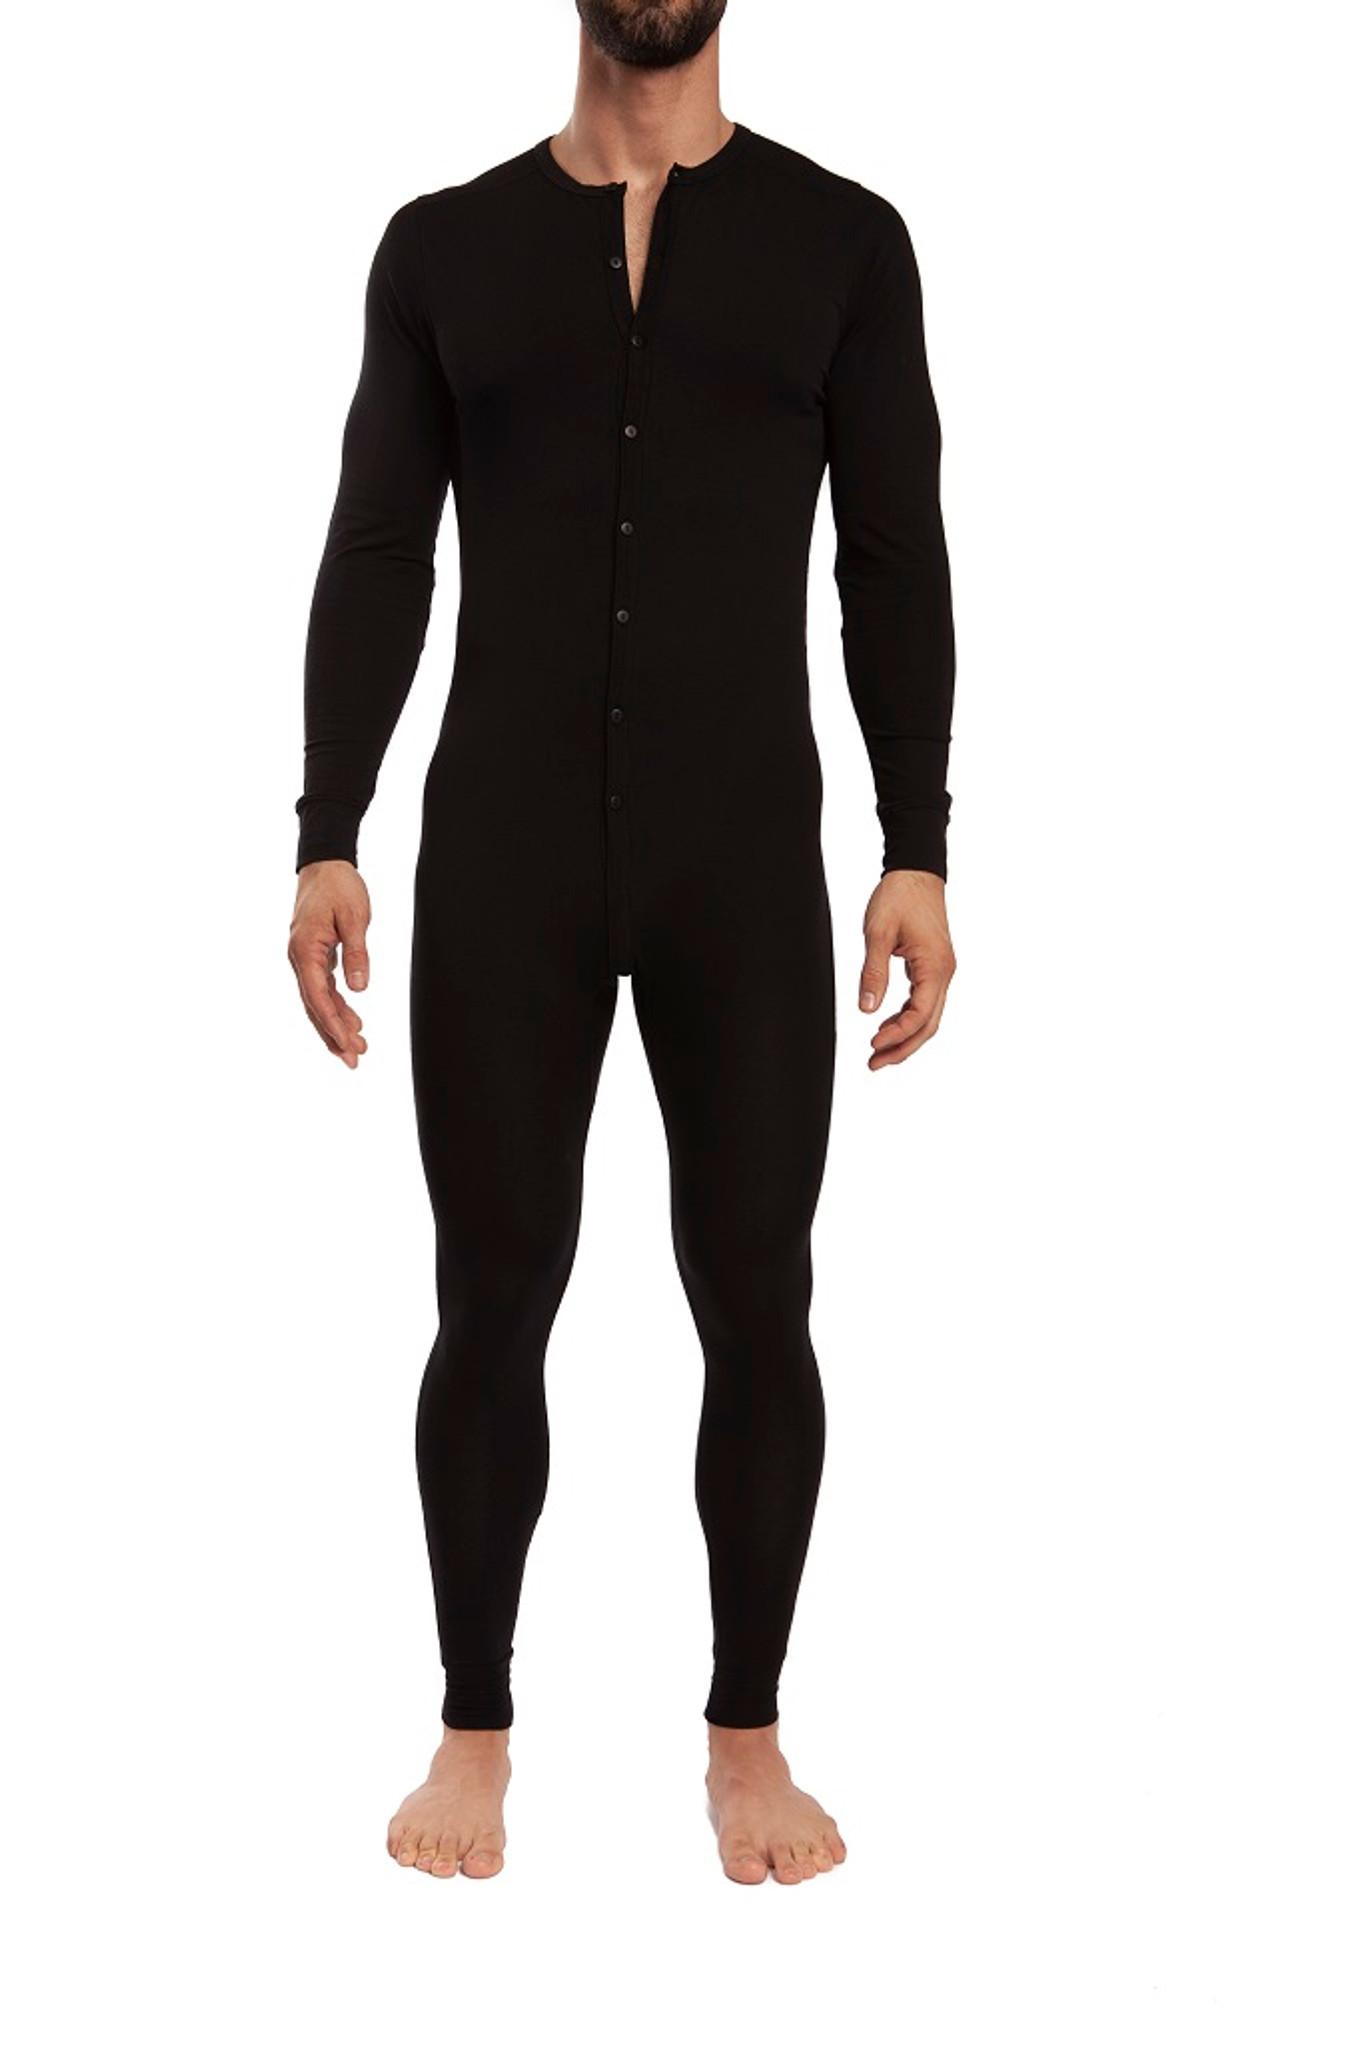 Jack Adams Union Suit in black